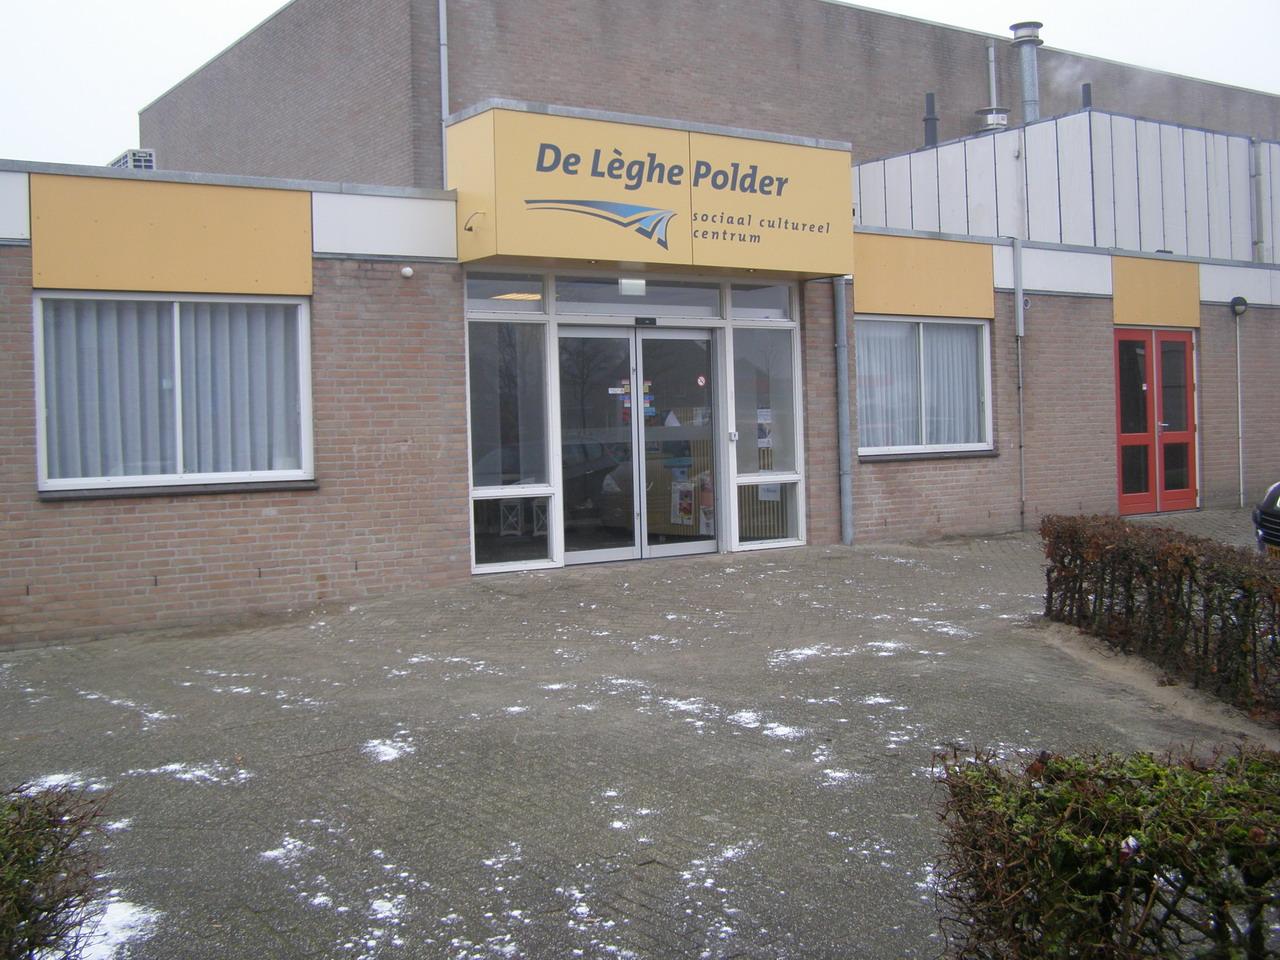 Dorpshuis De Lèghe Polder